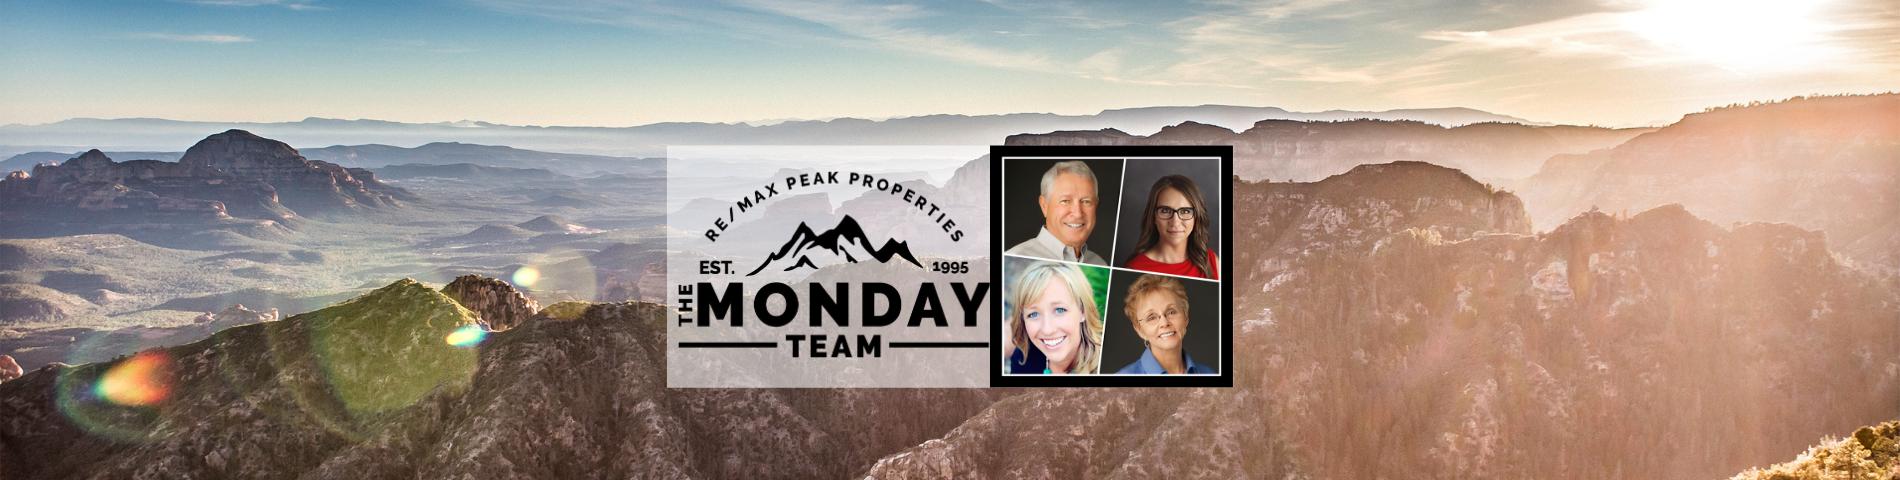 The Monday Team